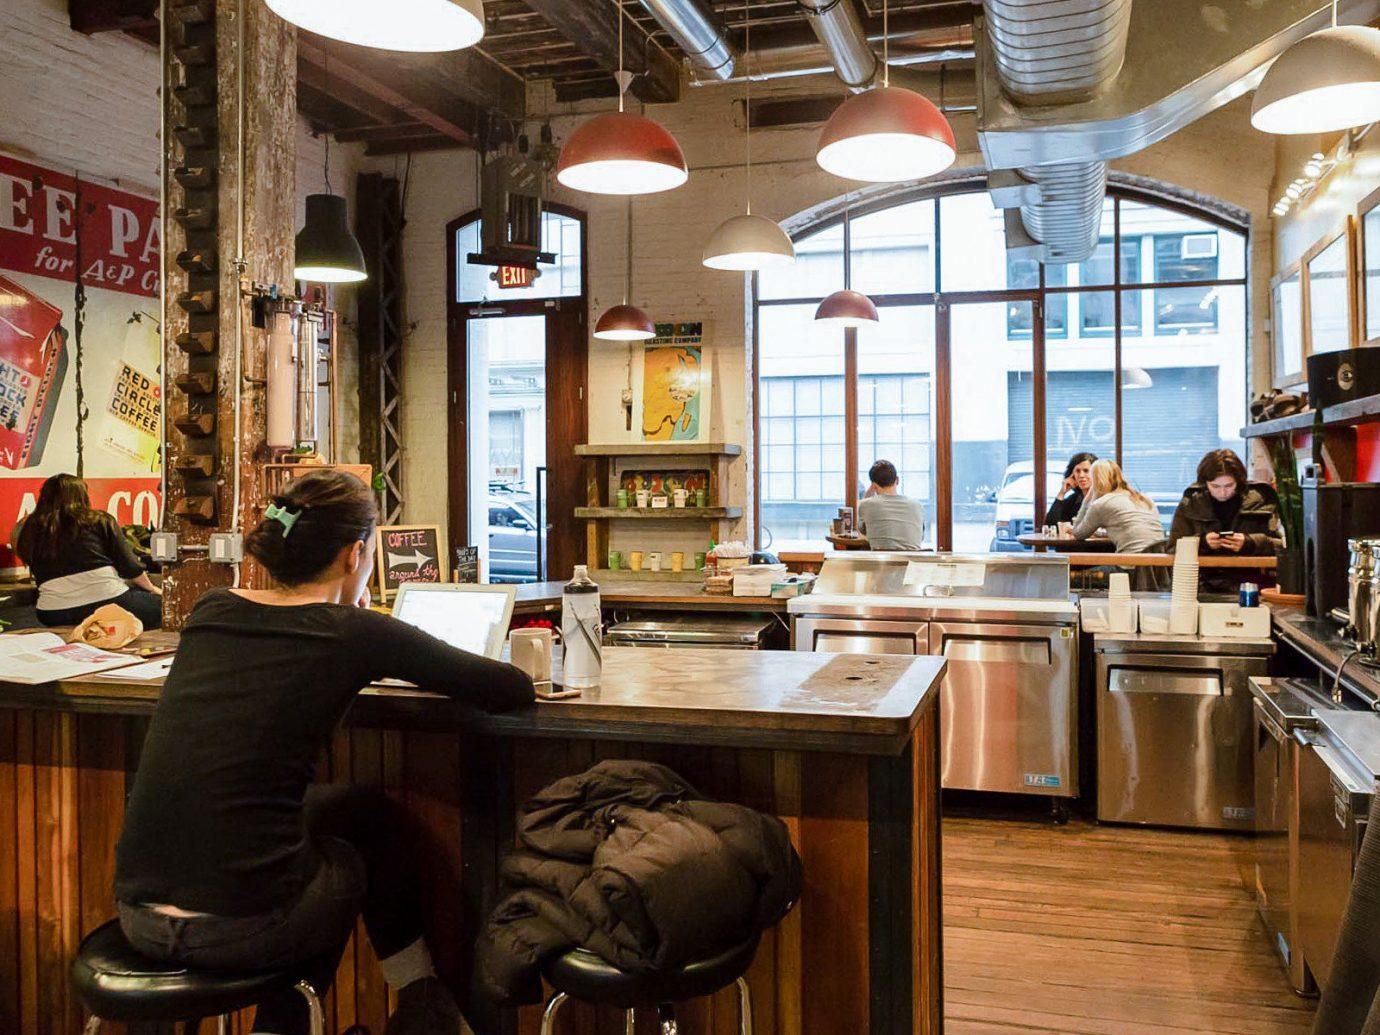 Brooklyn City Food + Drink NYC indoor floor interior design restaurant café coffeehouse area Bar furniture